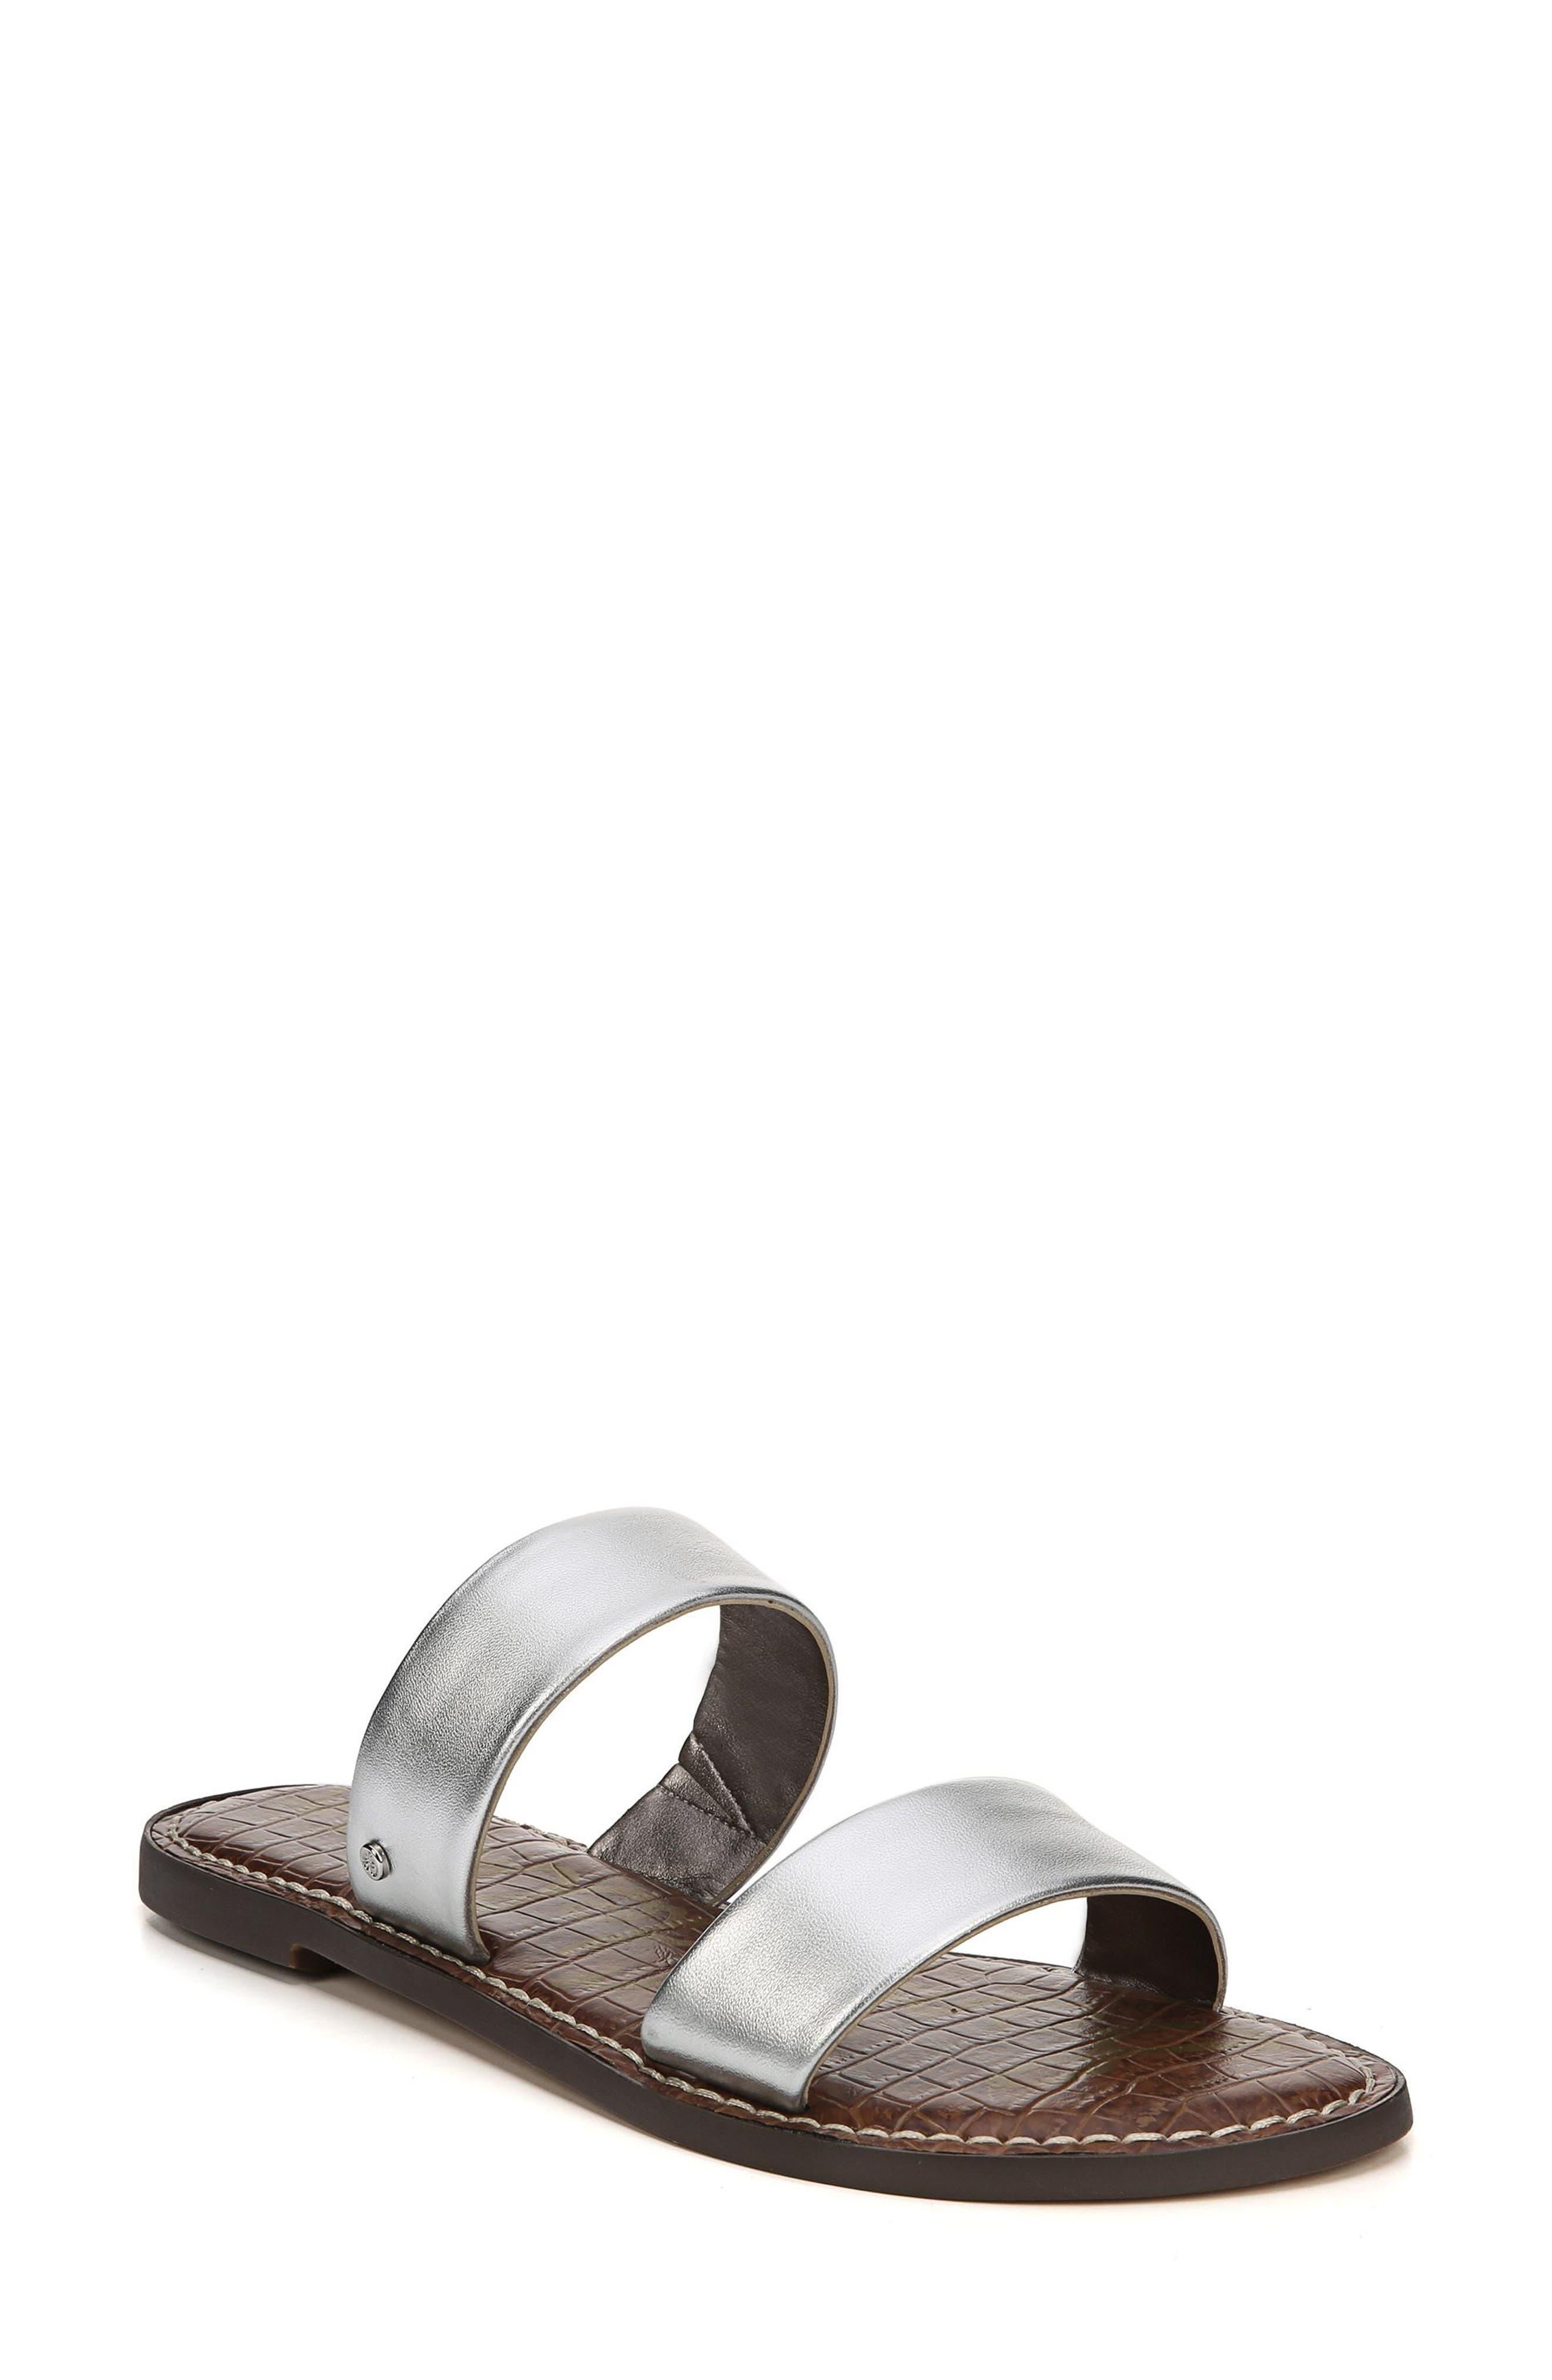 Gala Two Strap Slide Sandal,                             Main thumbnail 1, color,                             Silver Leather